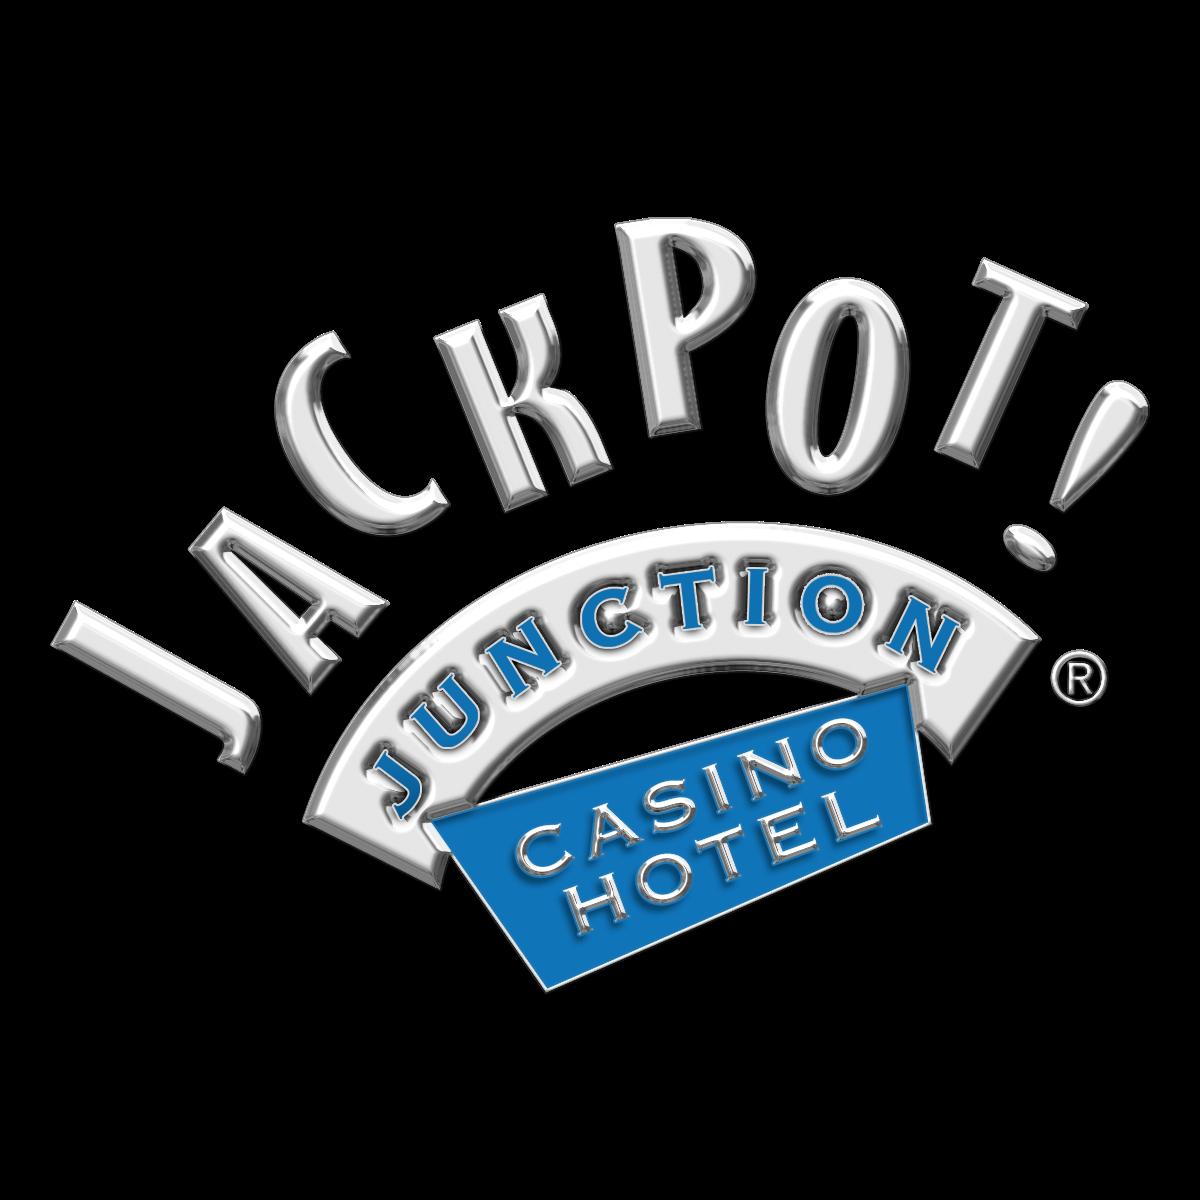 Jackpot Junction Casino Hotel image 5